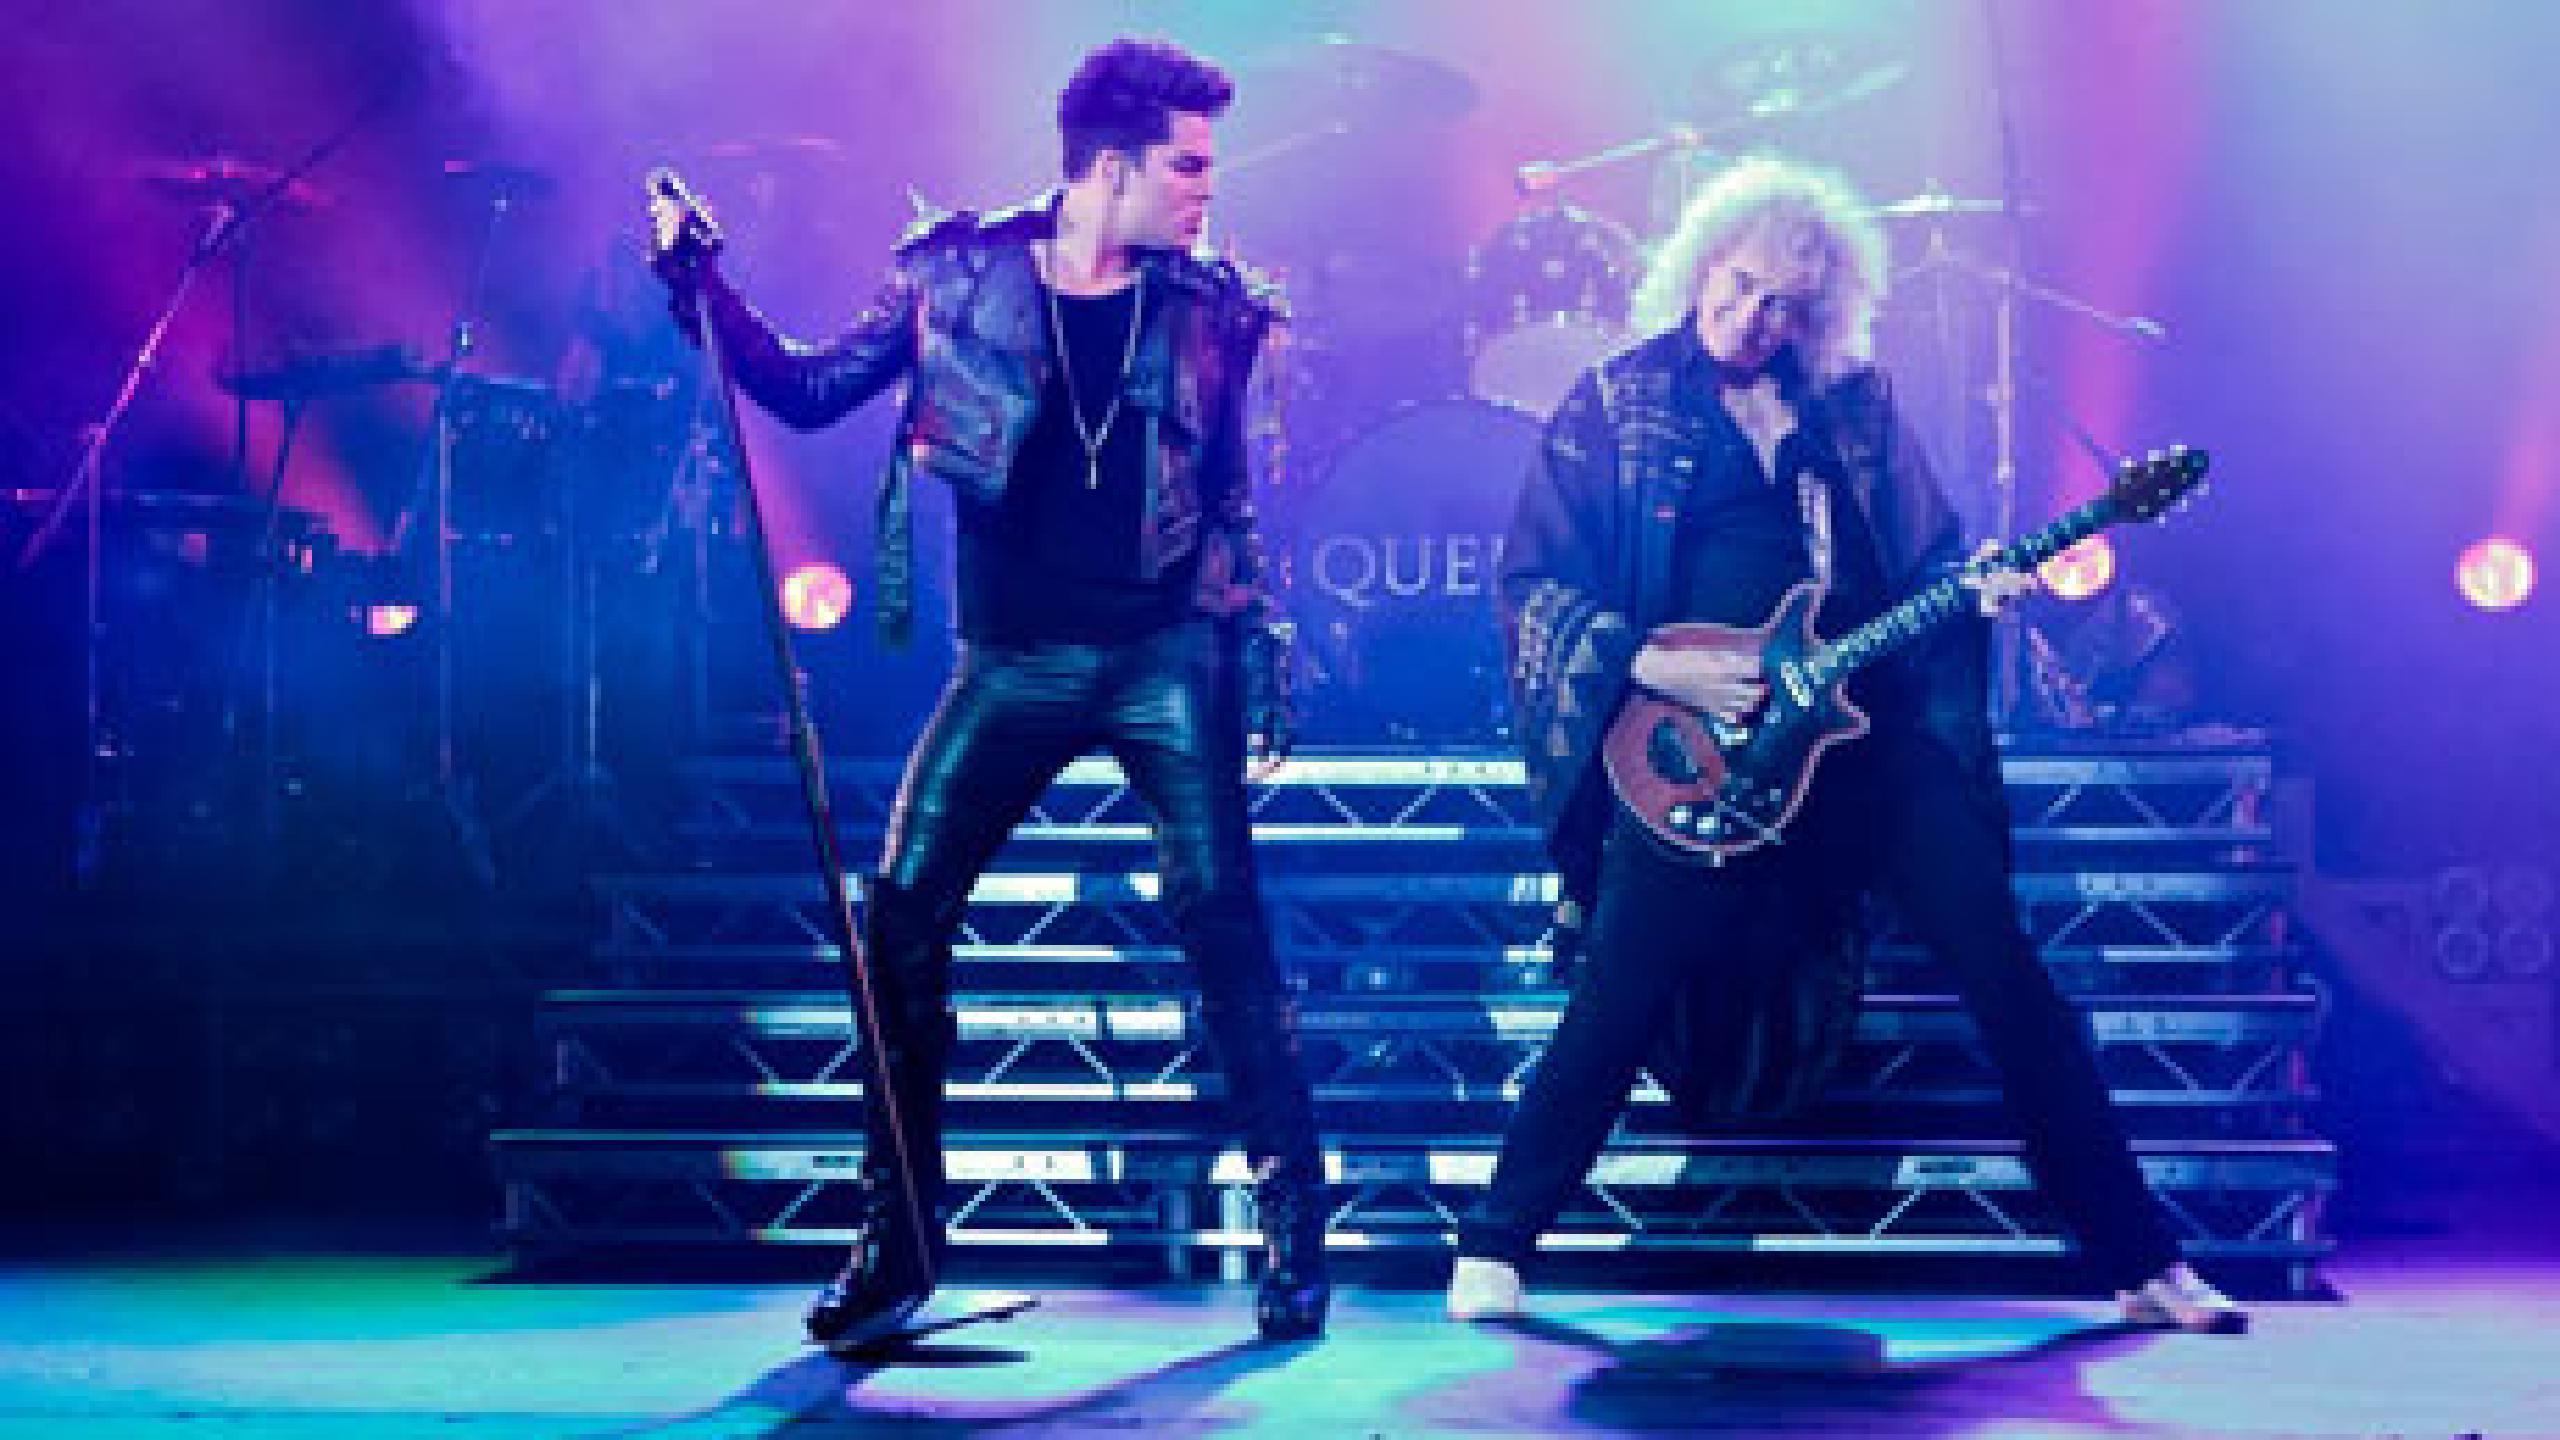 Queen & Adam Lambert Concert , HD Wallpaper & Backgrounds